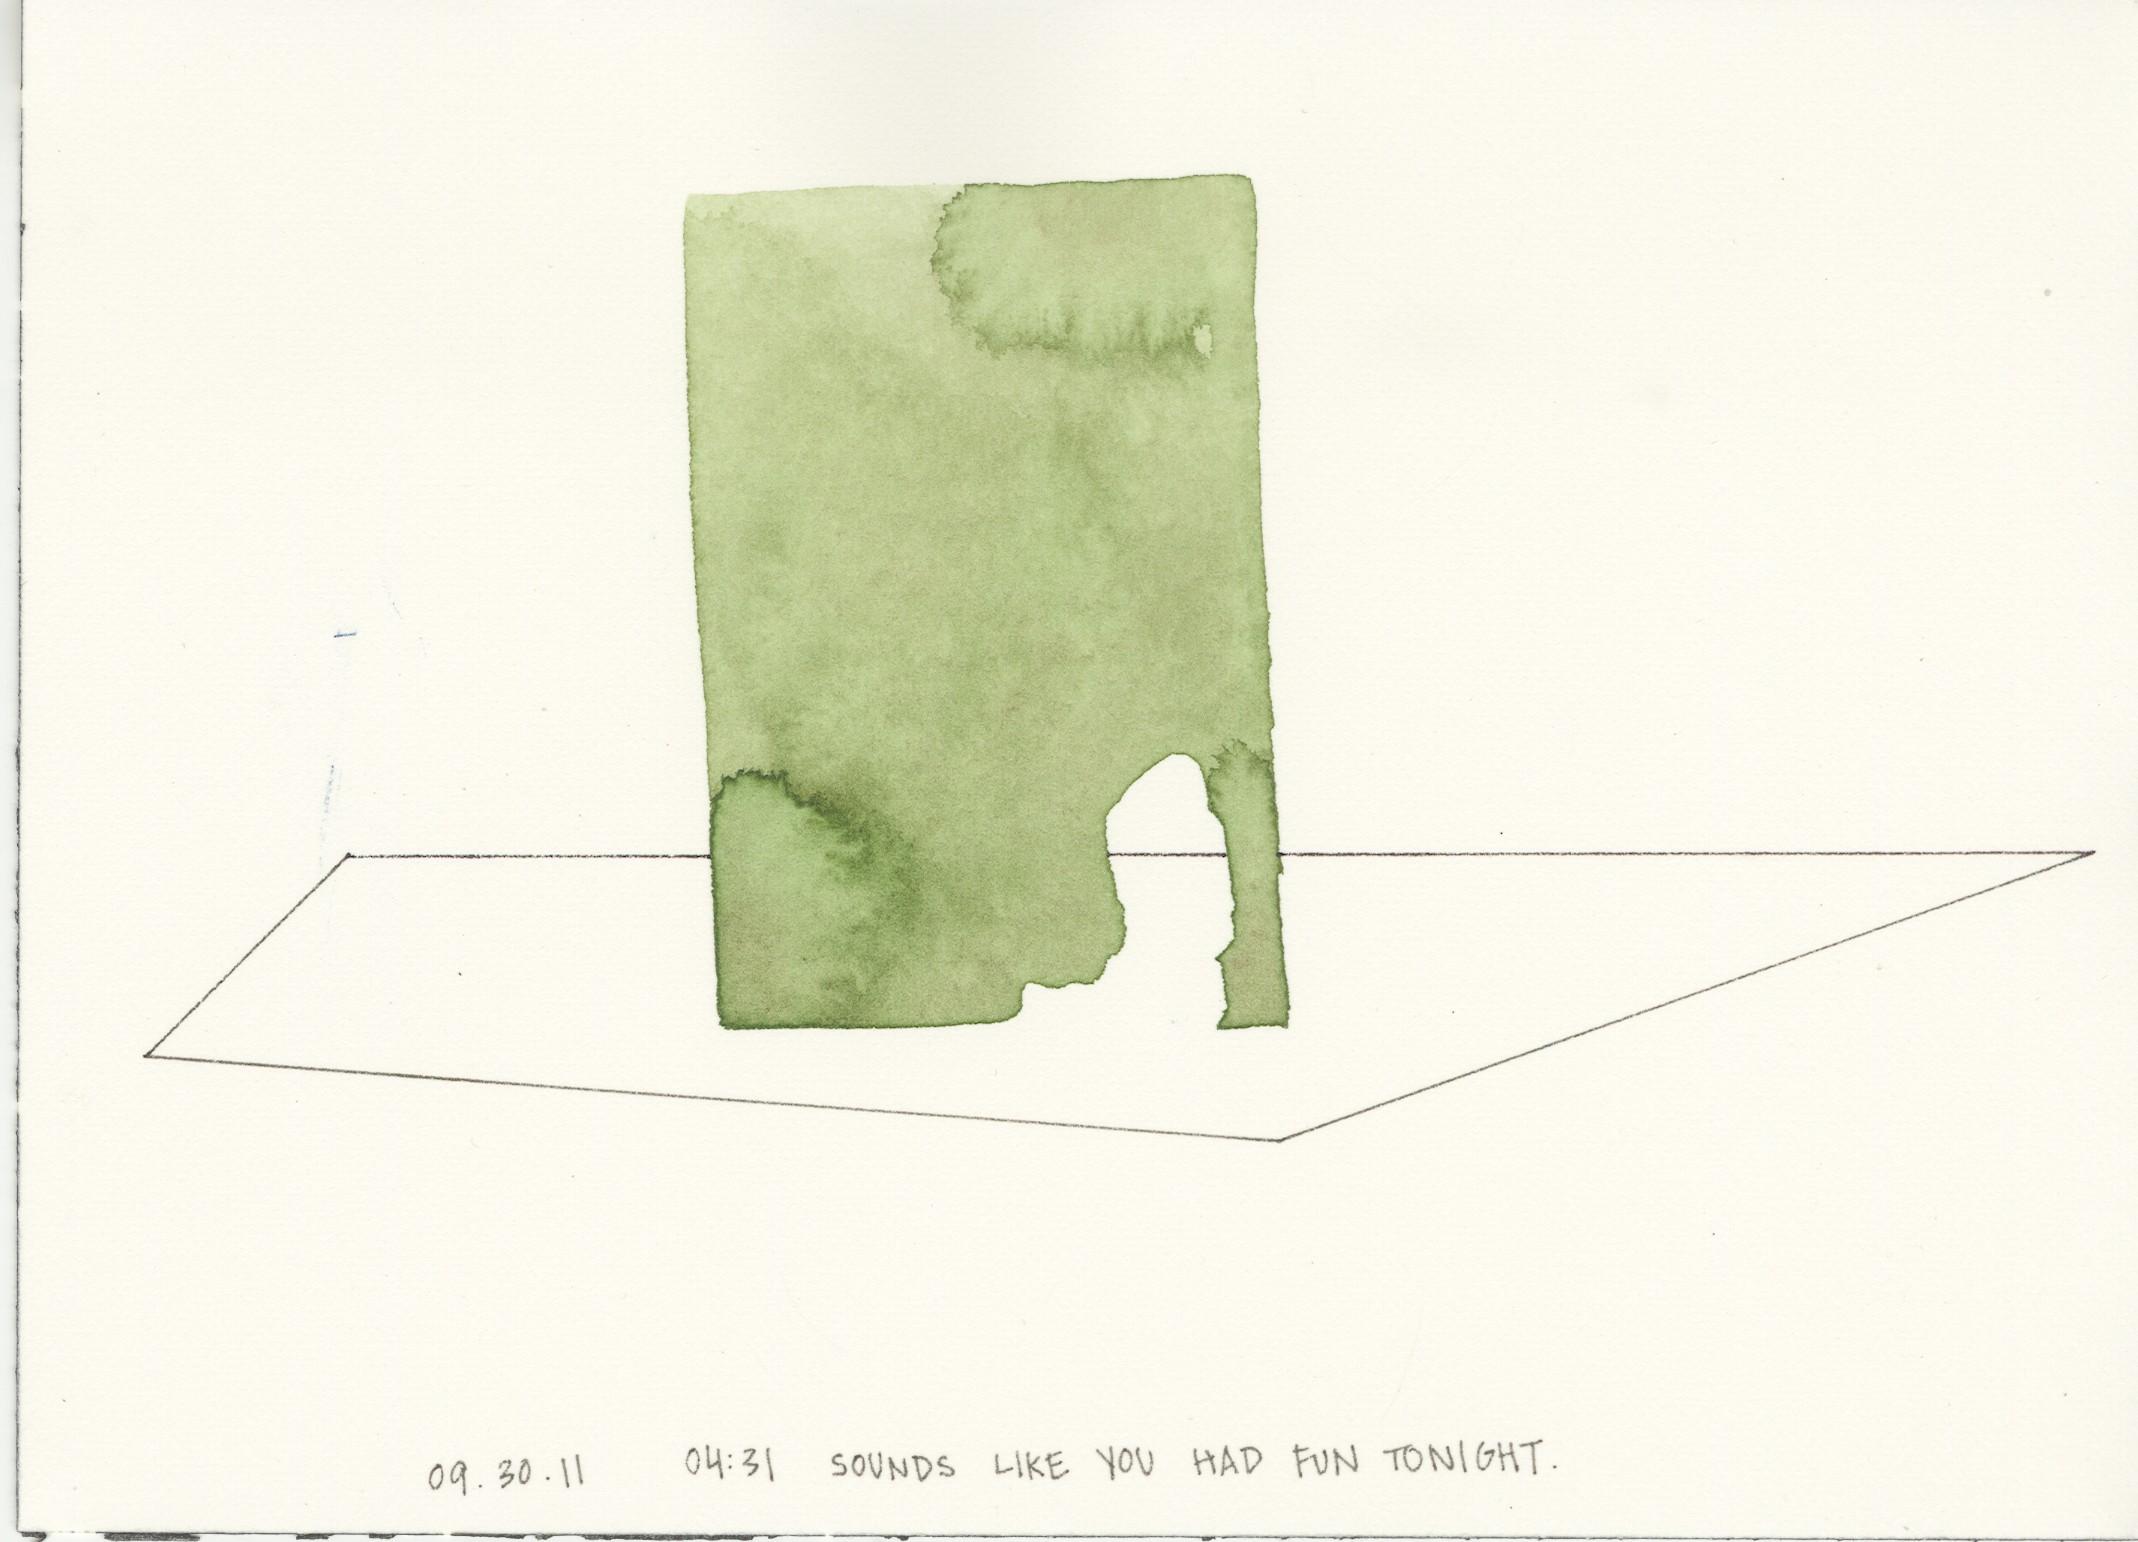 2011-10-28 drawing7.jpg